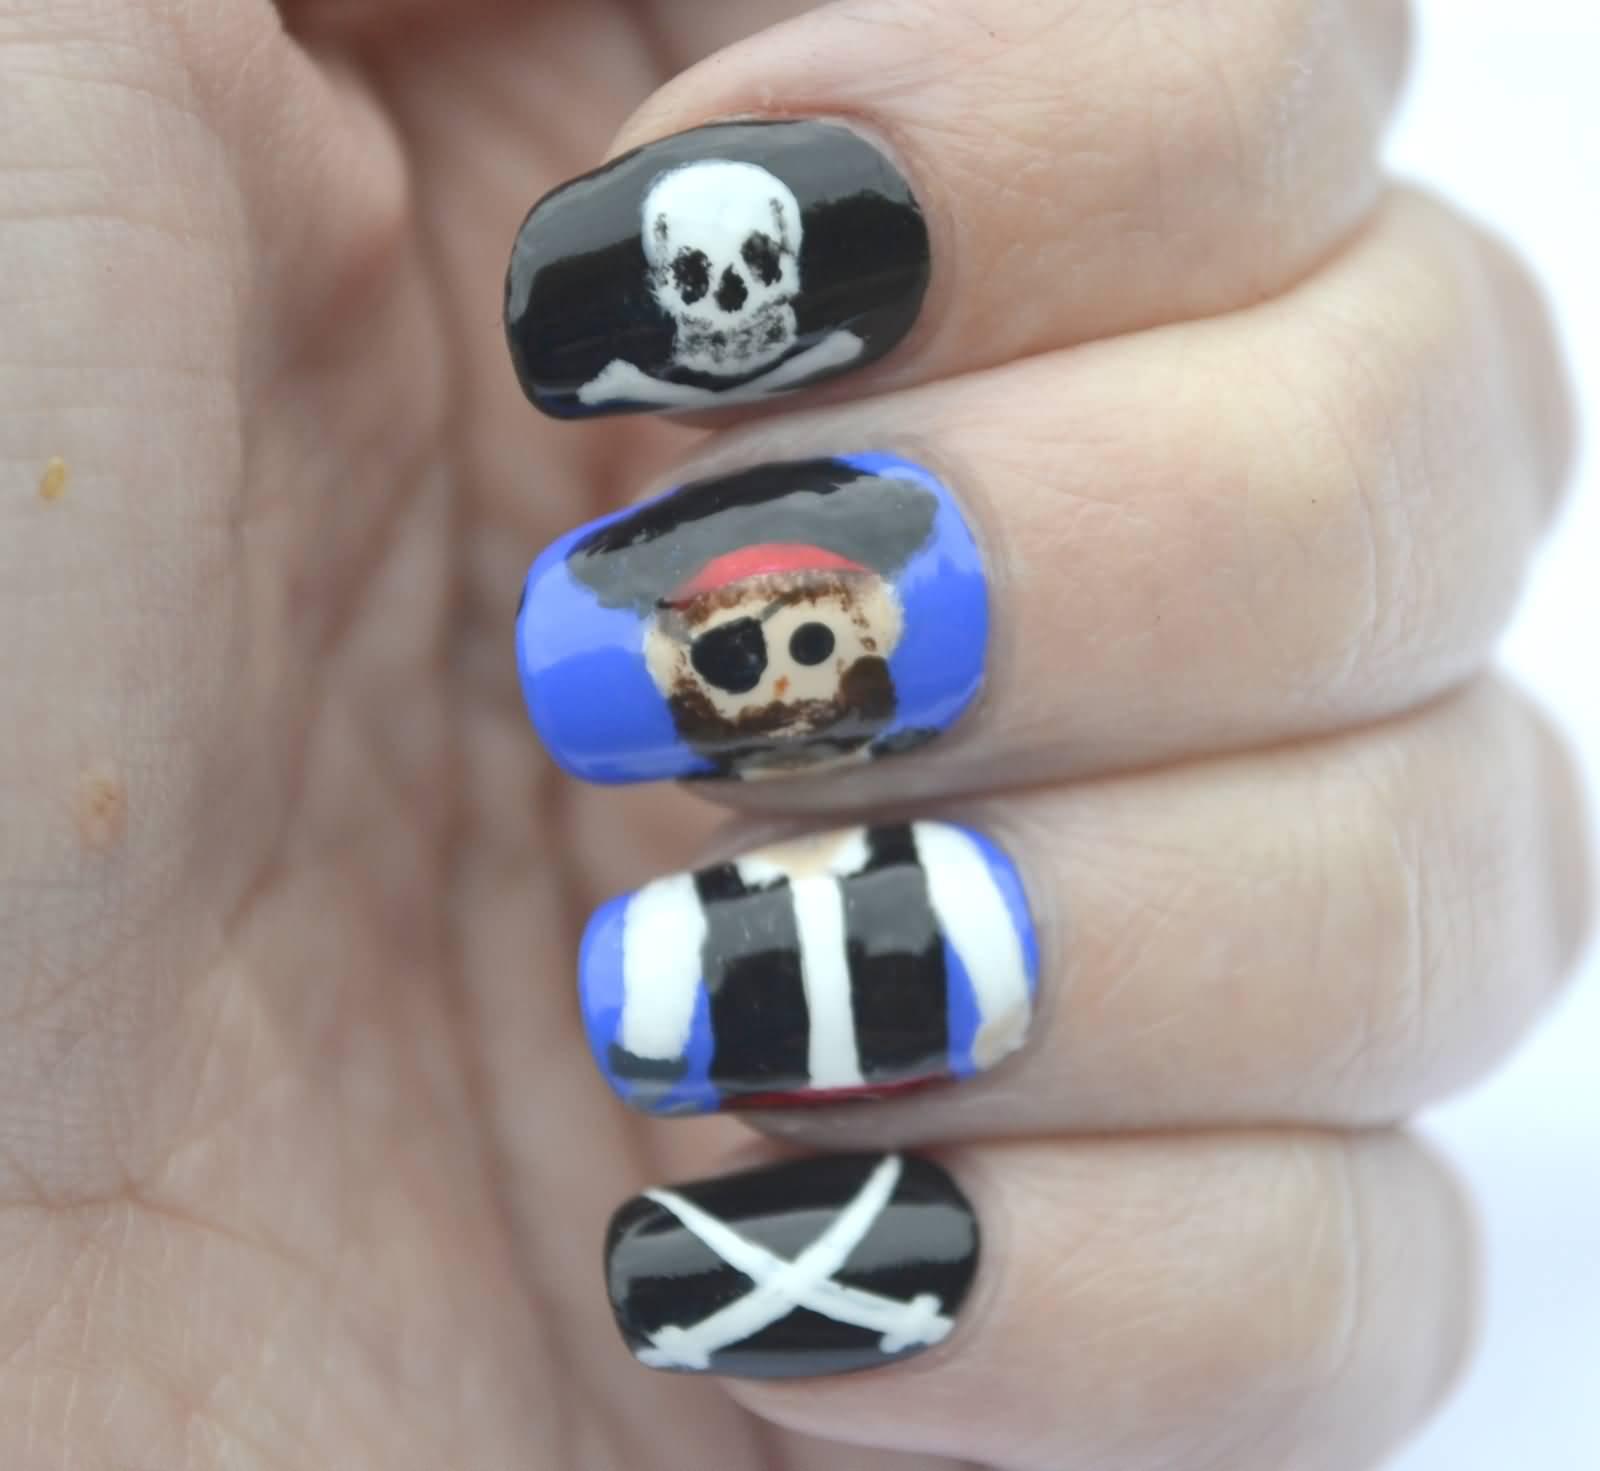 Pirate And Skull Nail Art Design Idea